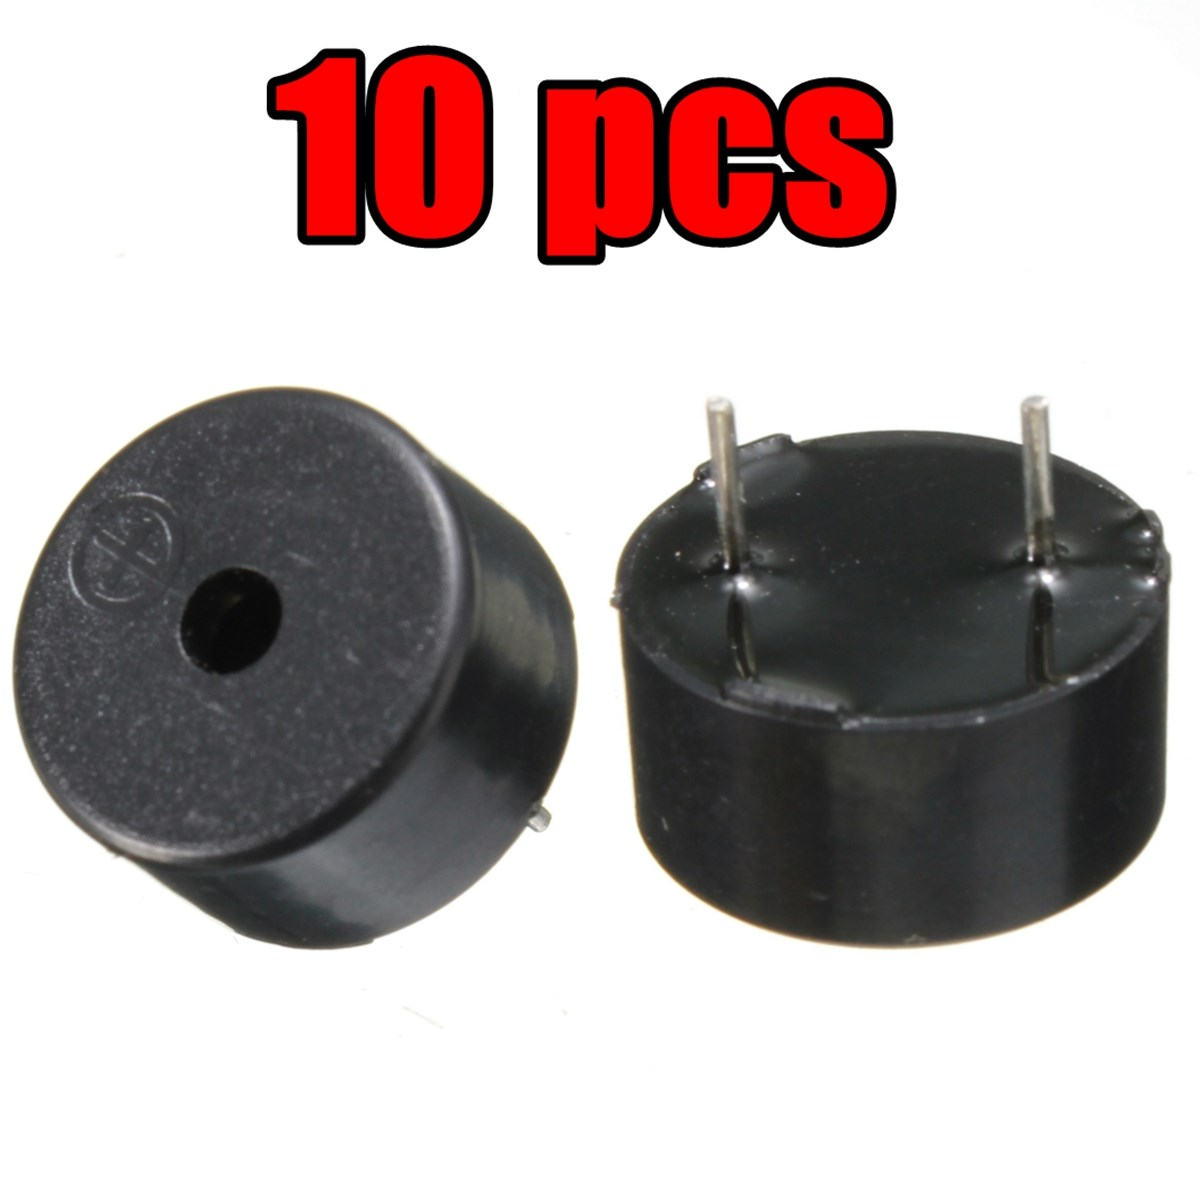 10PCs 2 Pin Passive Electronic Piezoelectric Piezo Buzzer AC 1-3V Black 14 x 7mm